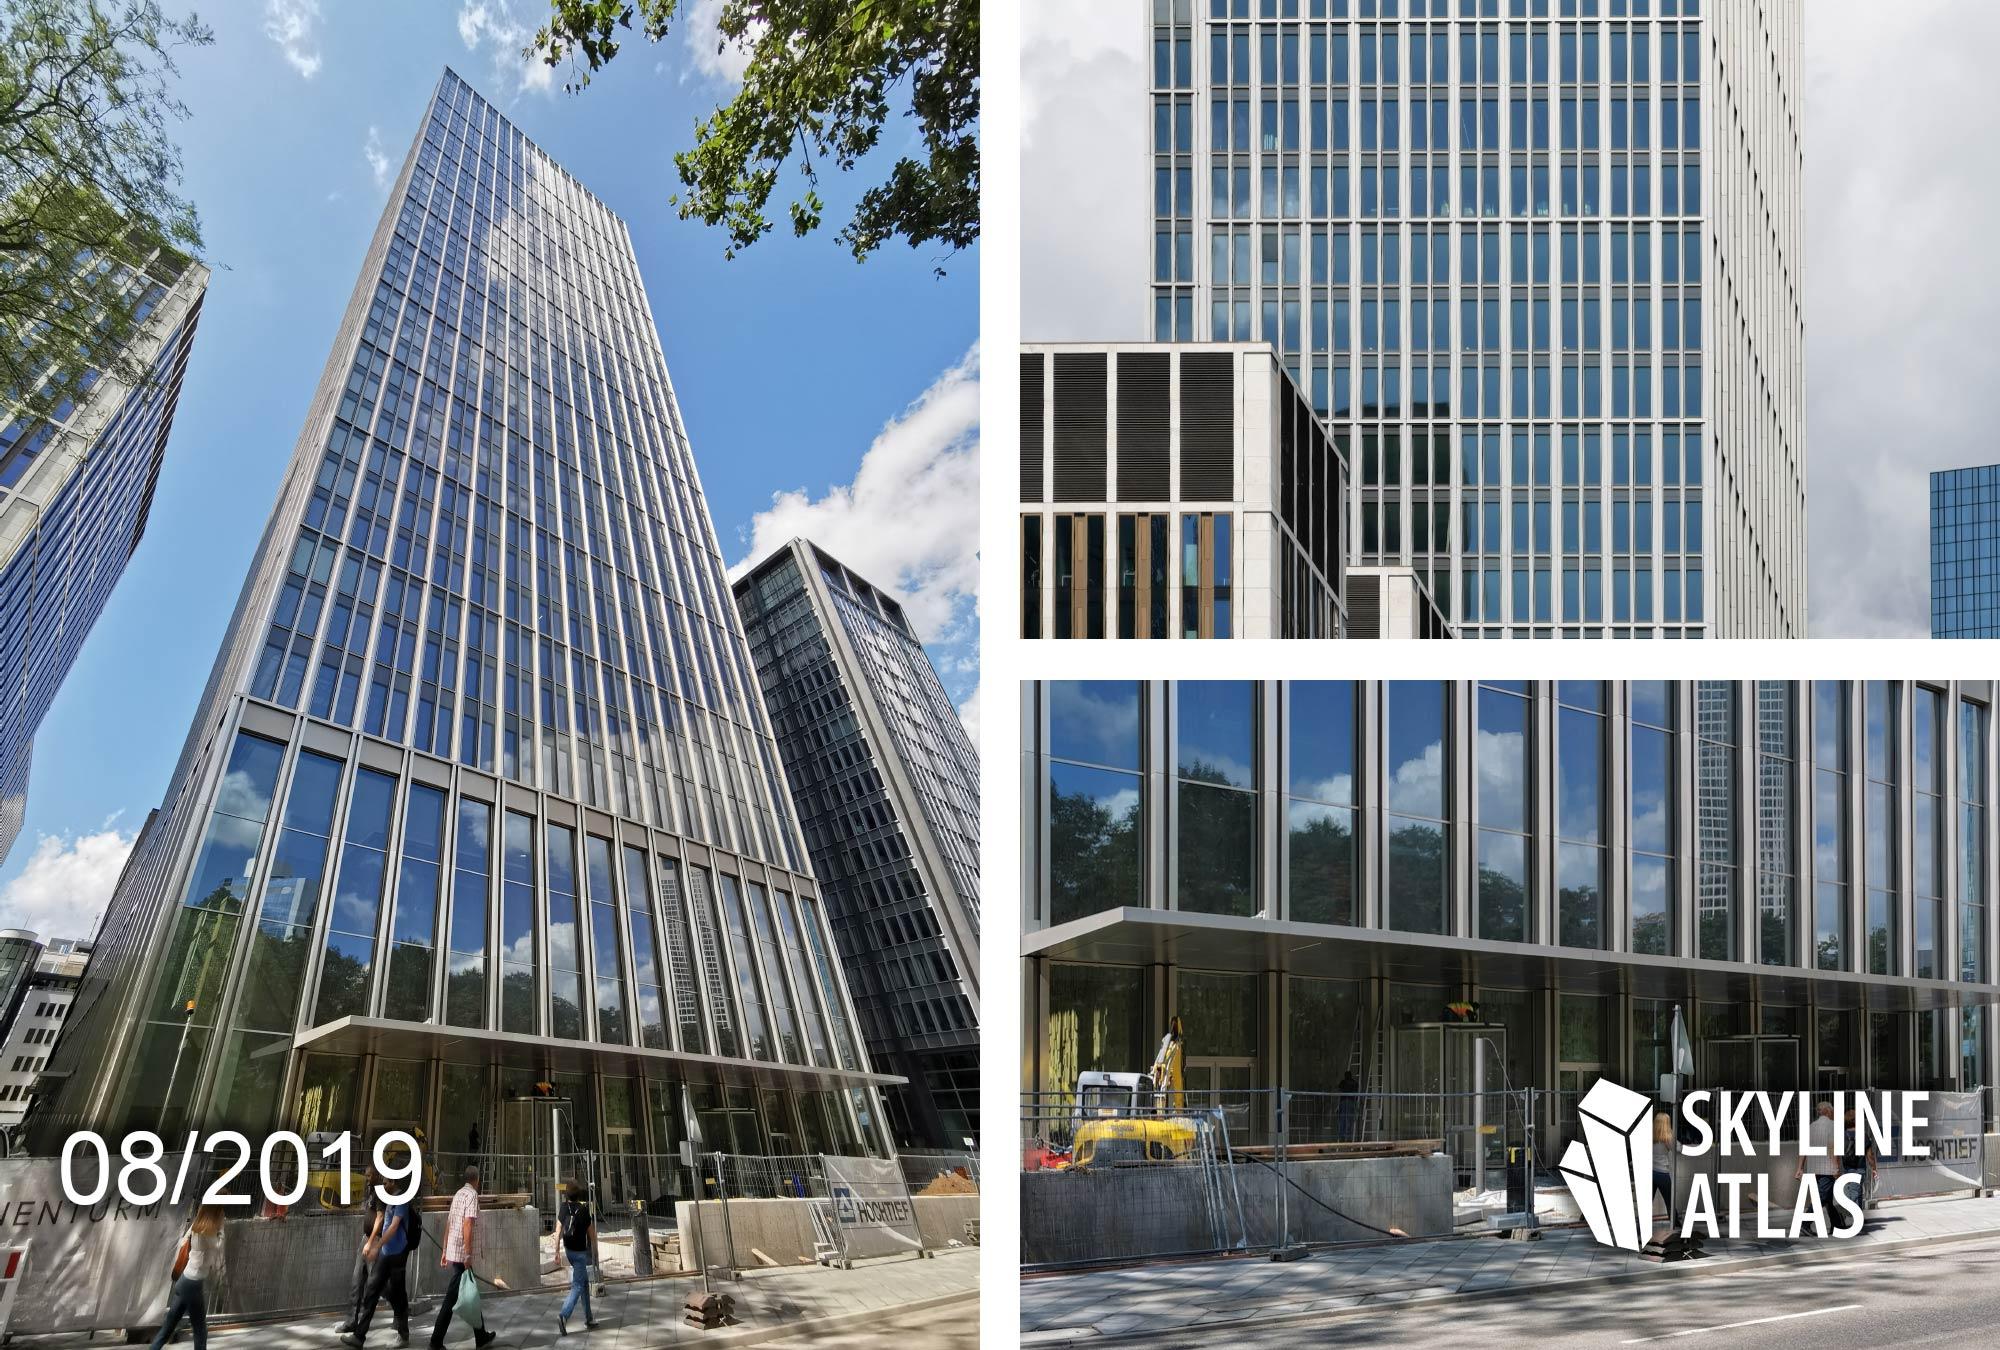 Marienturm in Frankfurt - Project Marieninsel of Pecan Development - Headquarters of Goldman Sachs Germany - Taunusanlage highrise as of August 2019